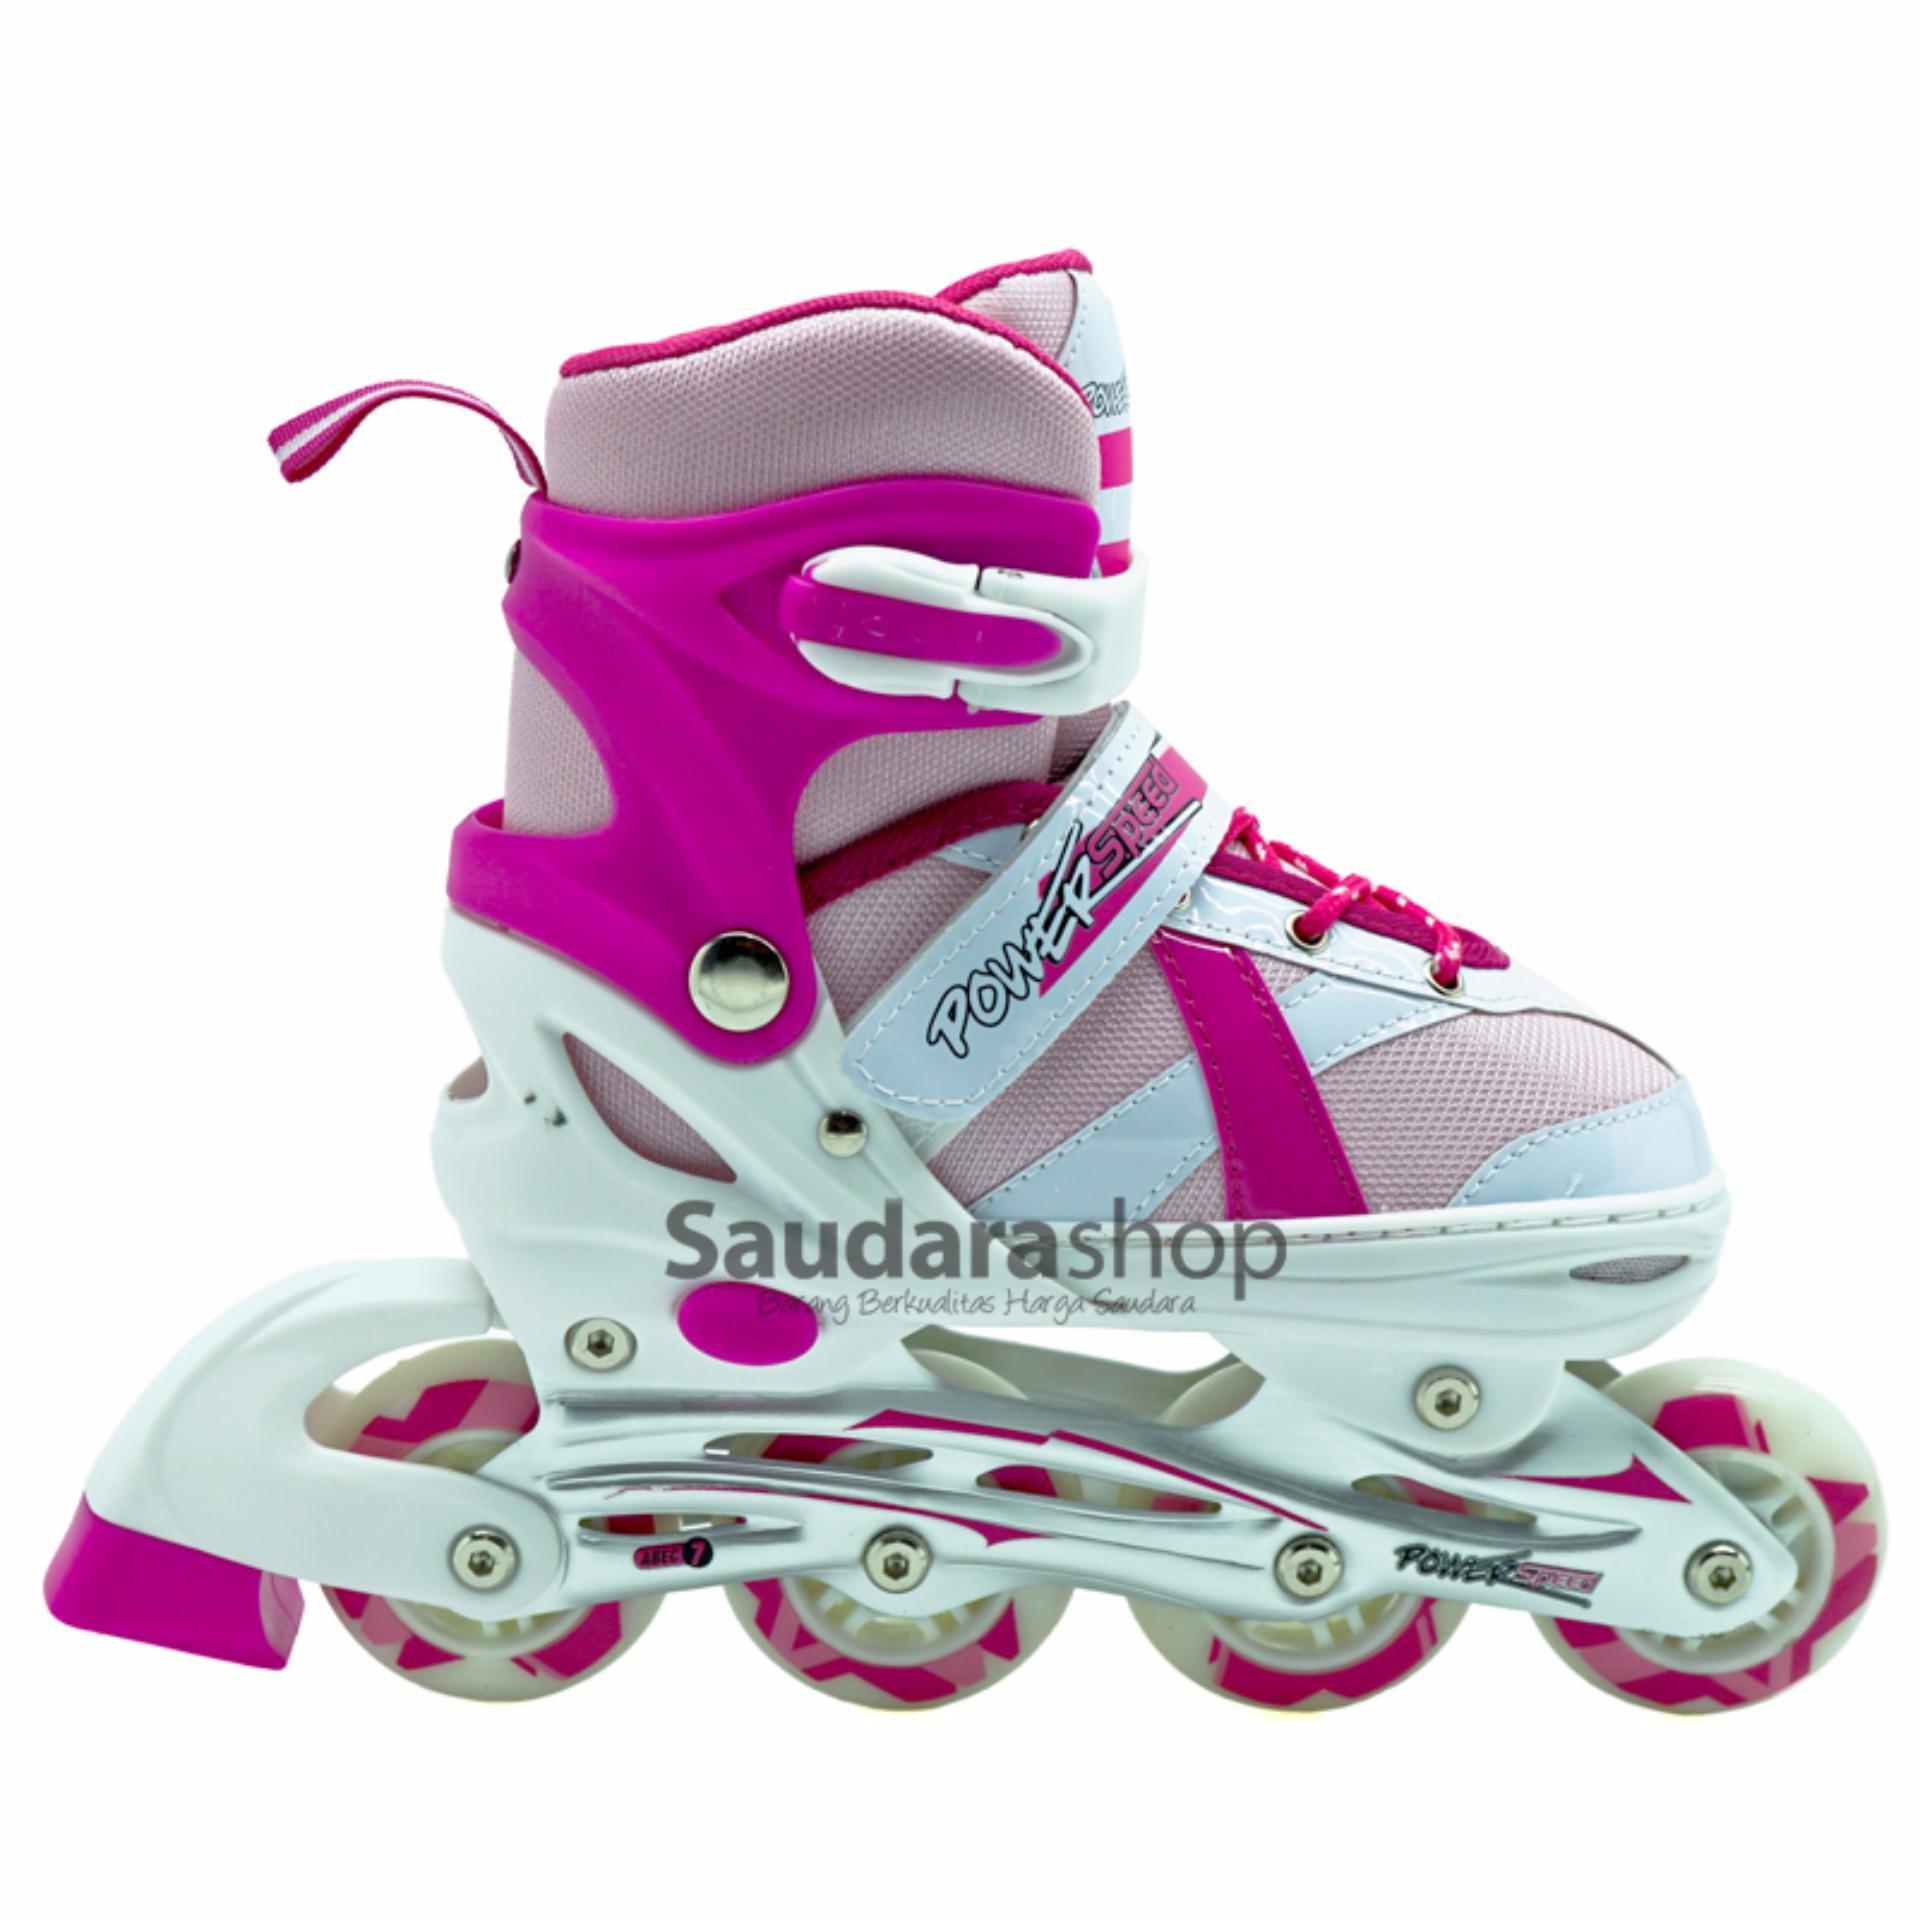 Power Speed Sepaturoda Inline Pink Sepatu Roda Inline Skate Pink ... 23abbe92dd